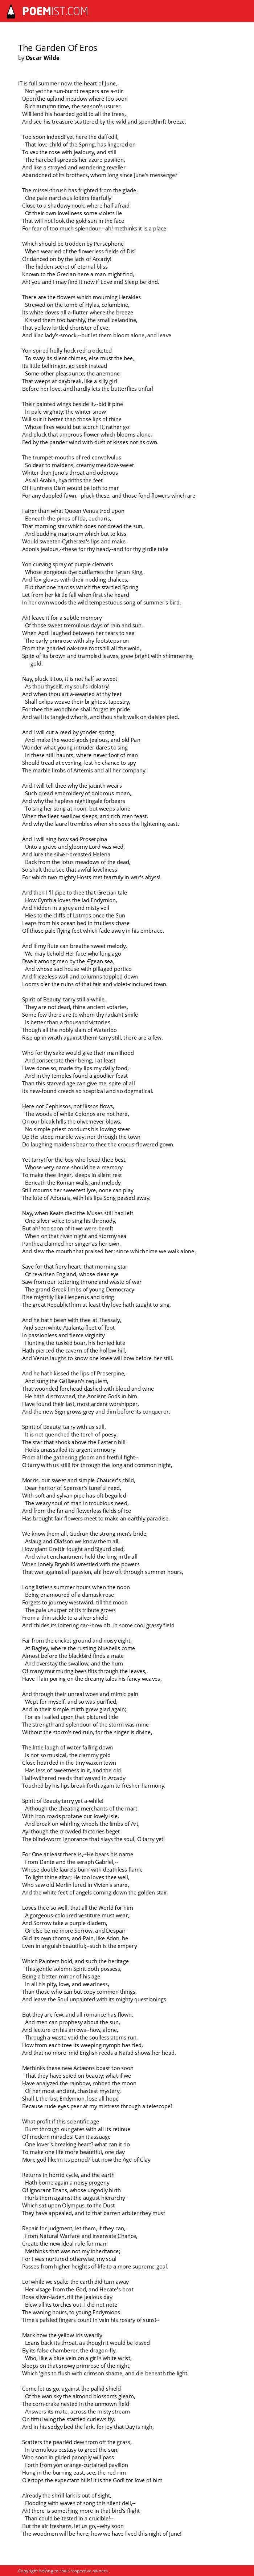 The Garden Of Eros By Oscar Wilde Poemist